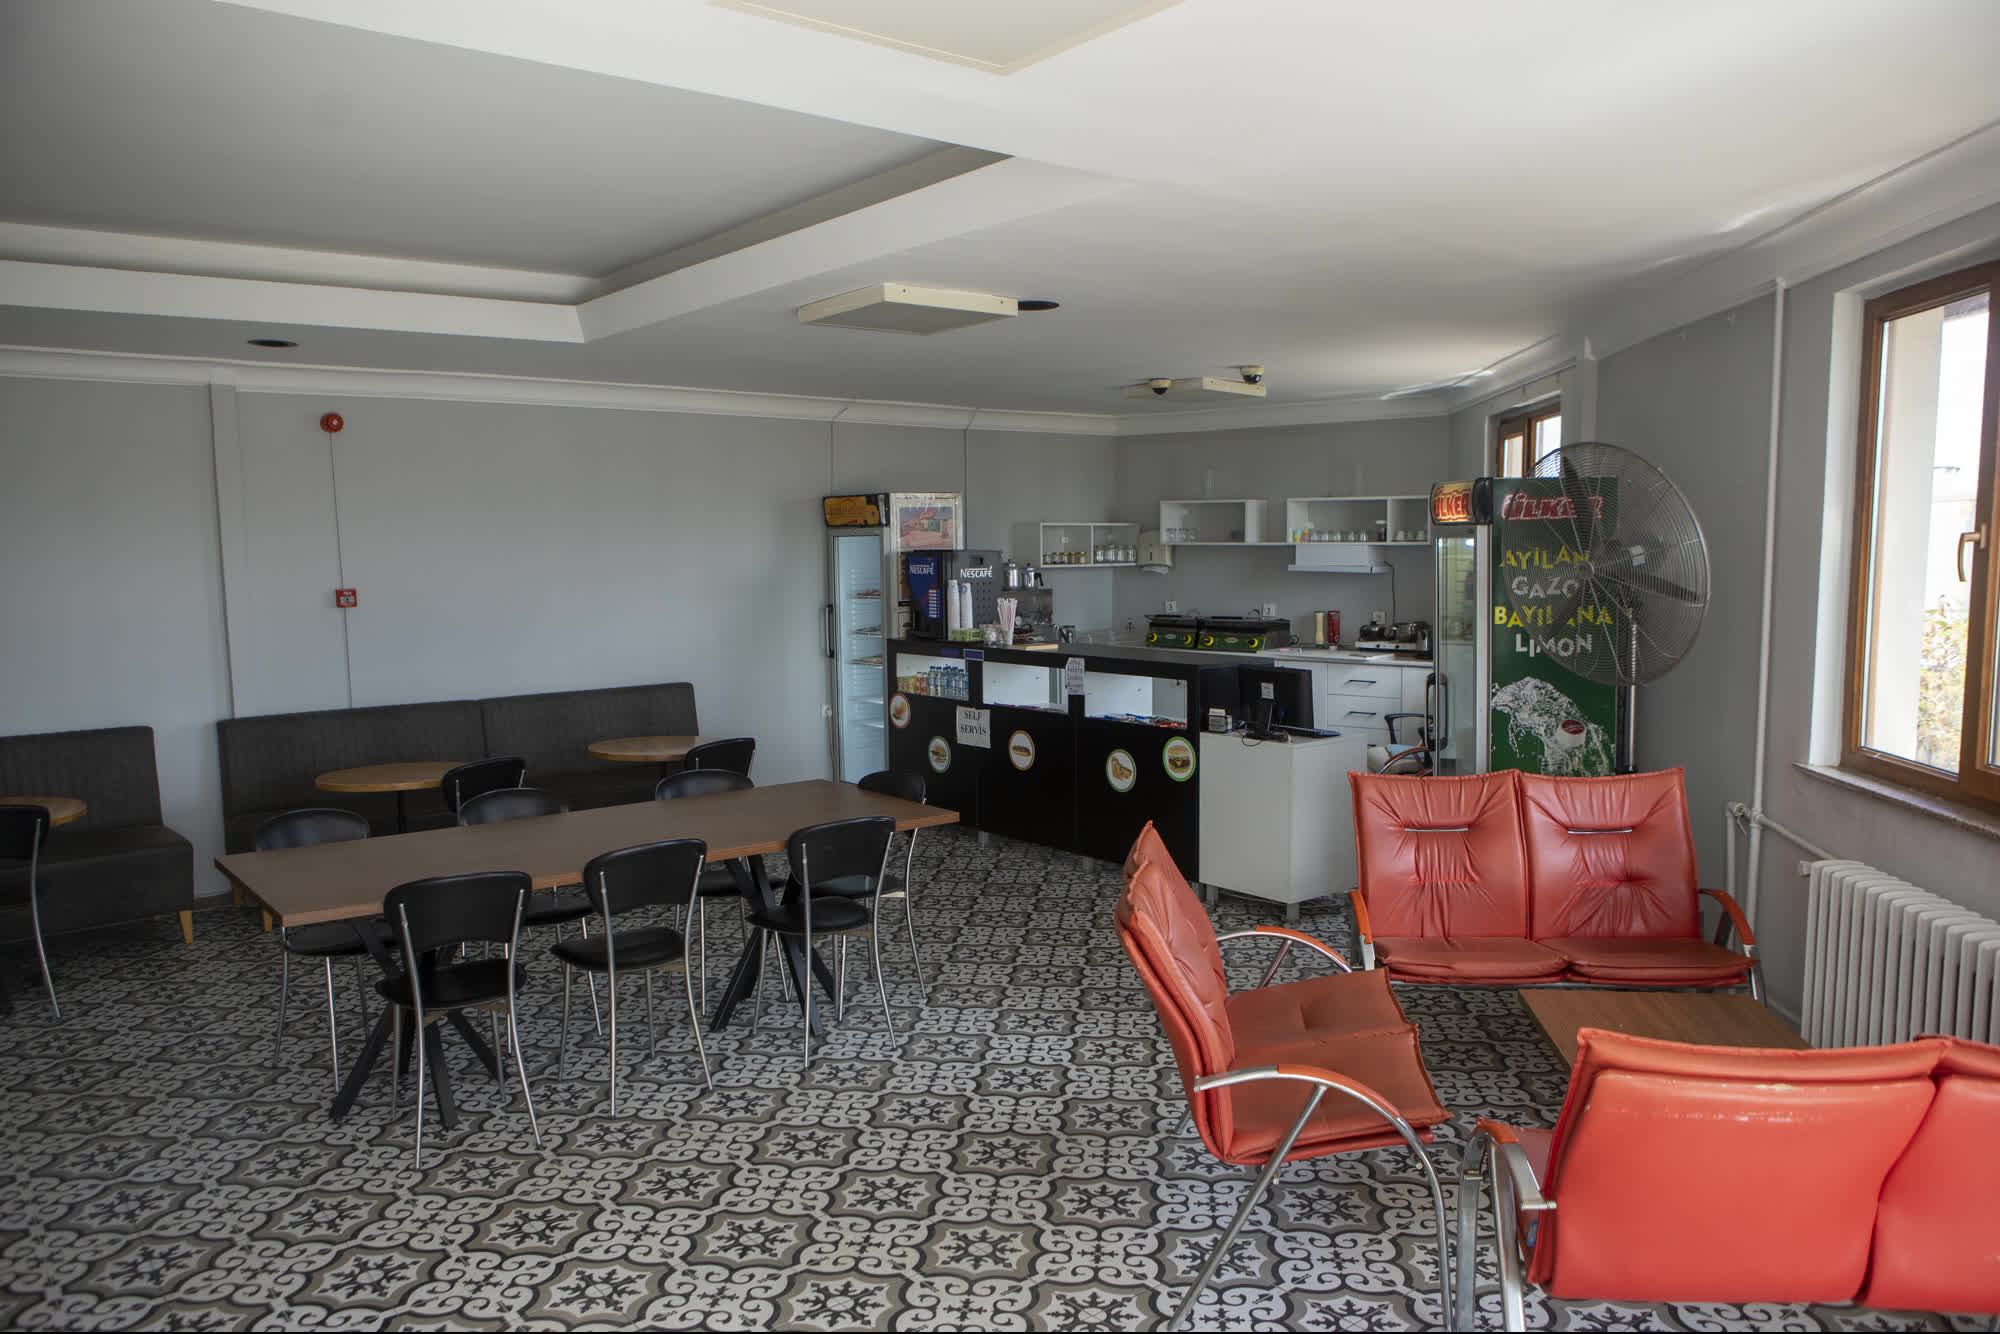 Just English Dil Okulları İstanbul/Ataköy Şubesi